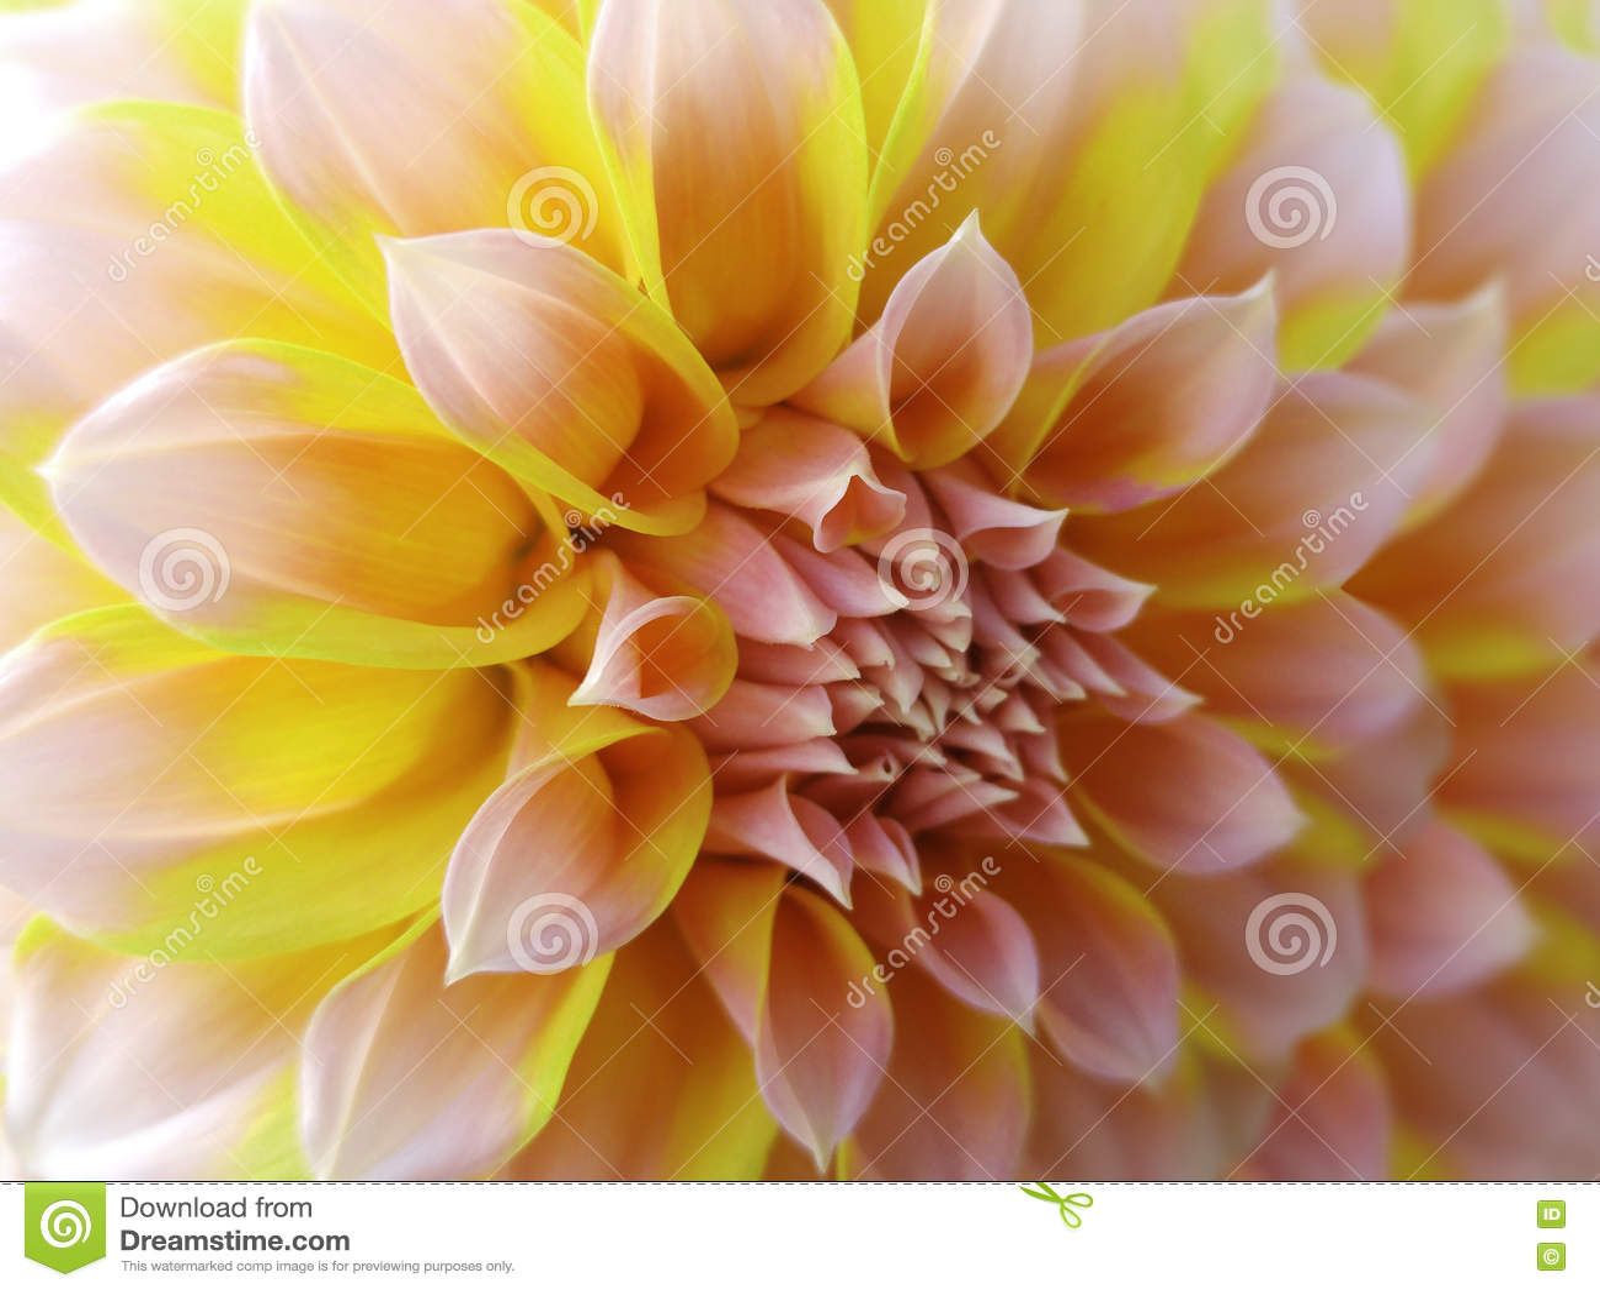 fleur de dahlia, jaune-orange-rose closeup beau dahlia la fleur de